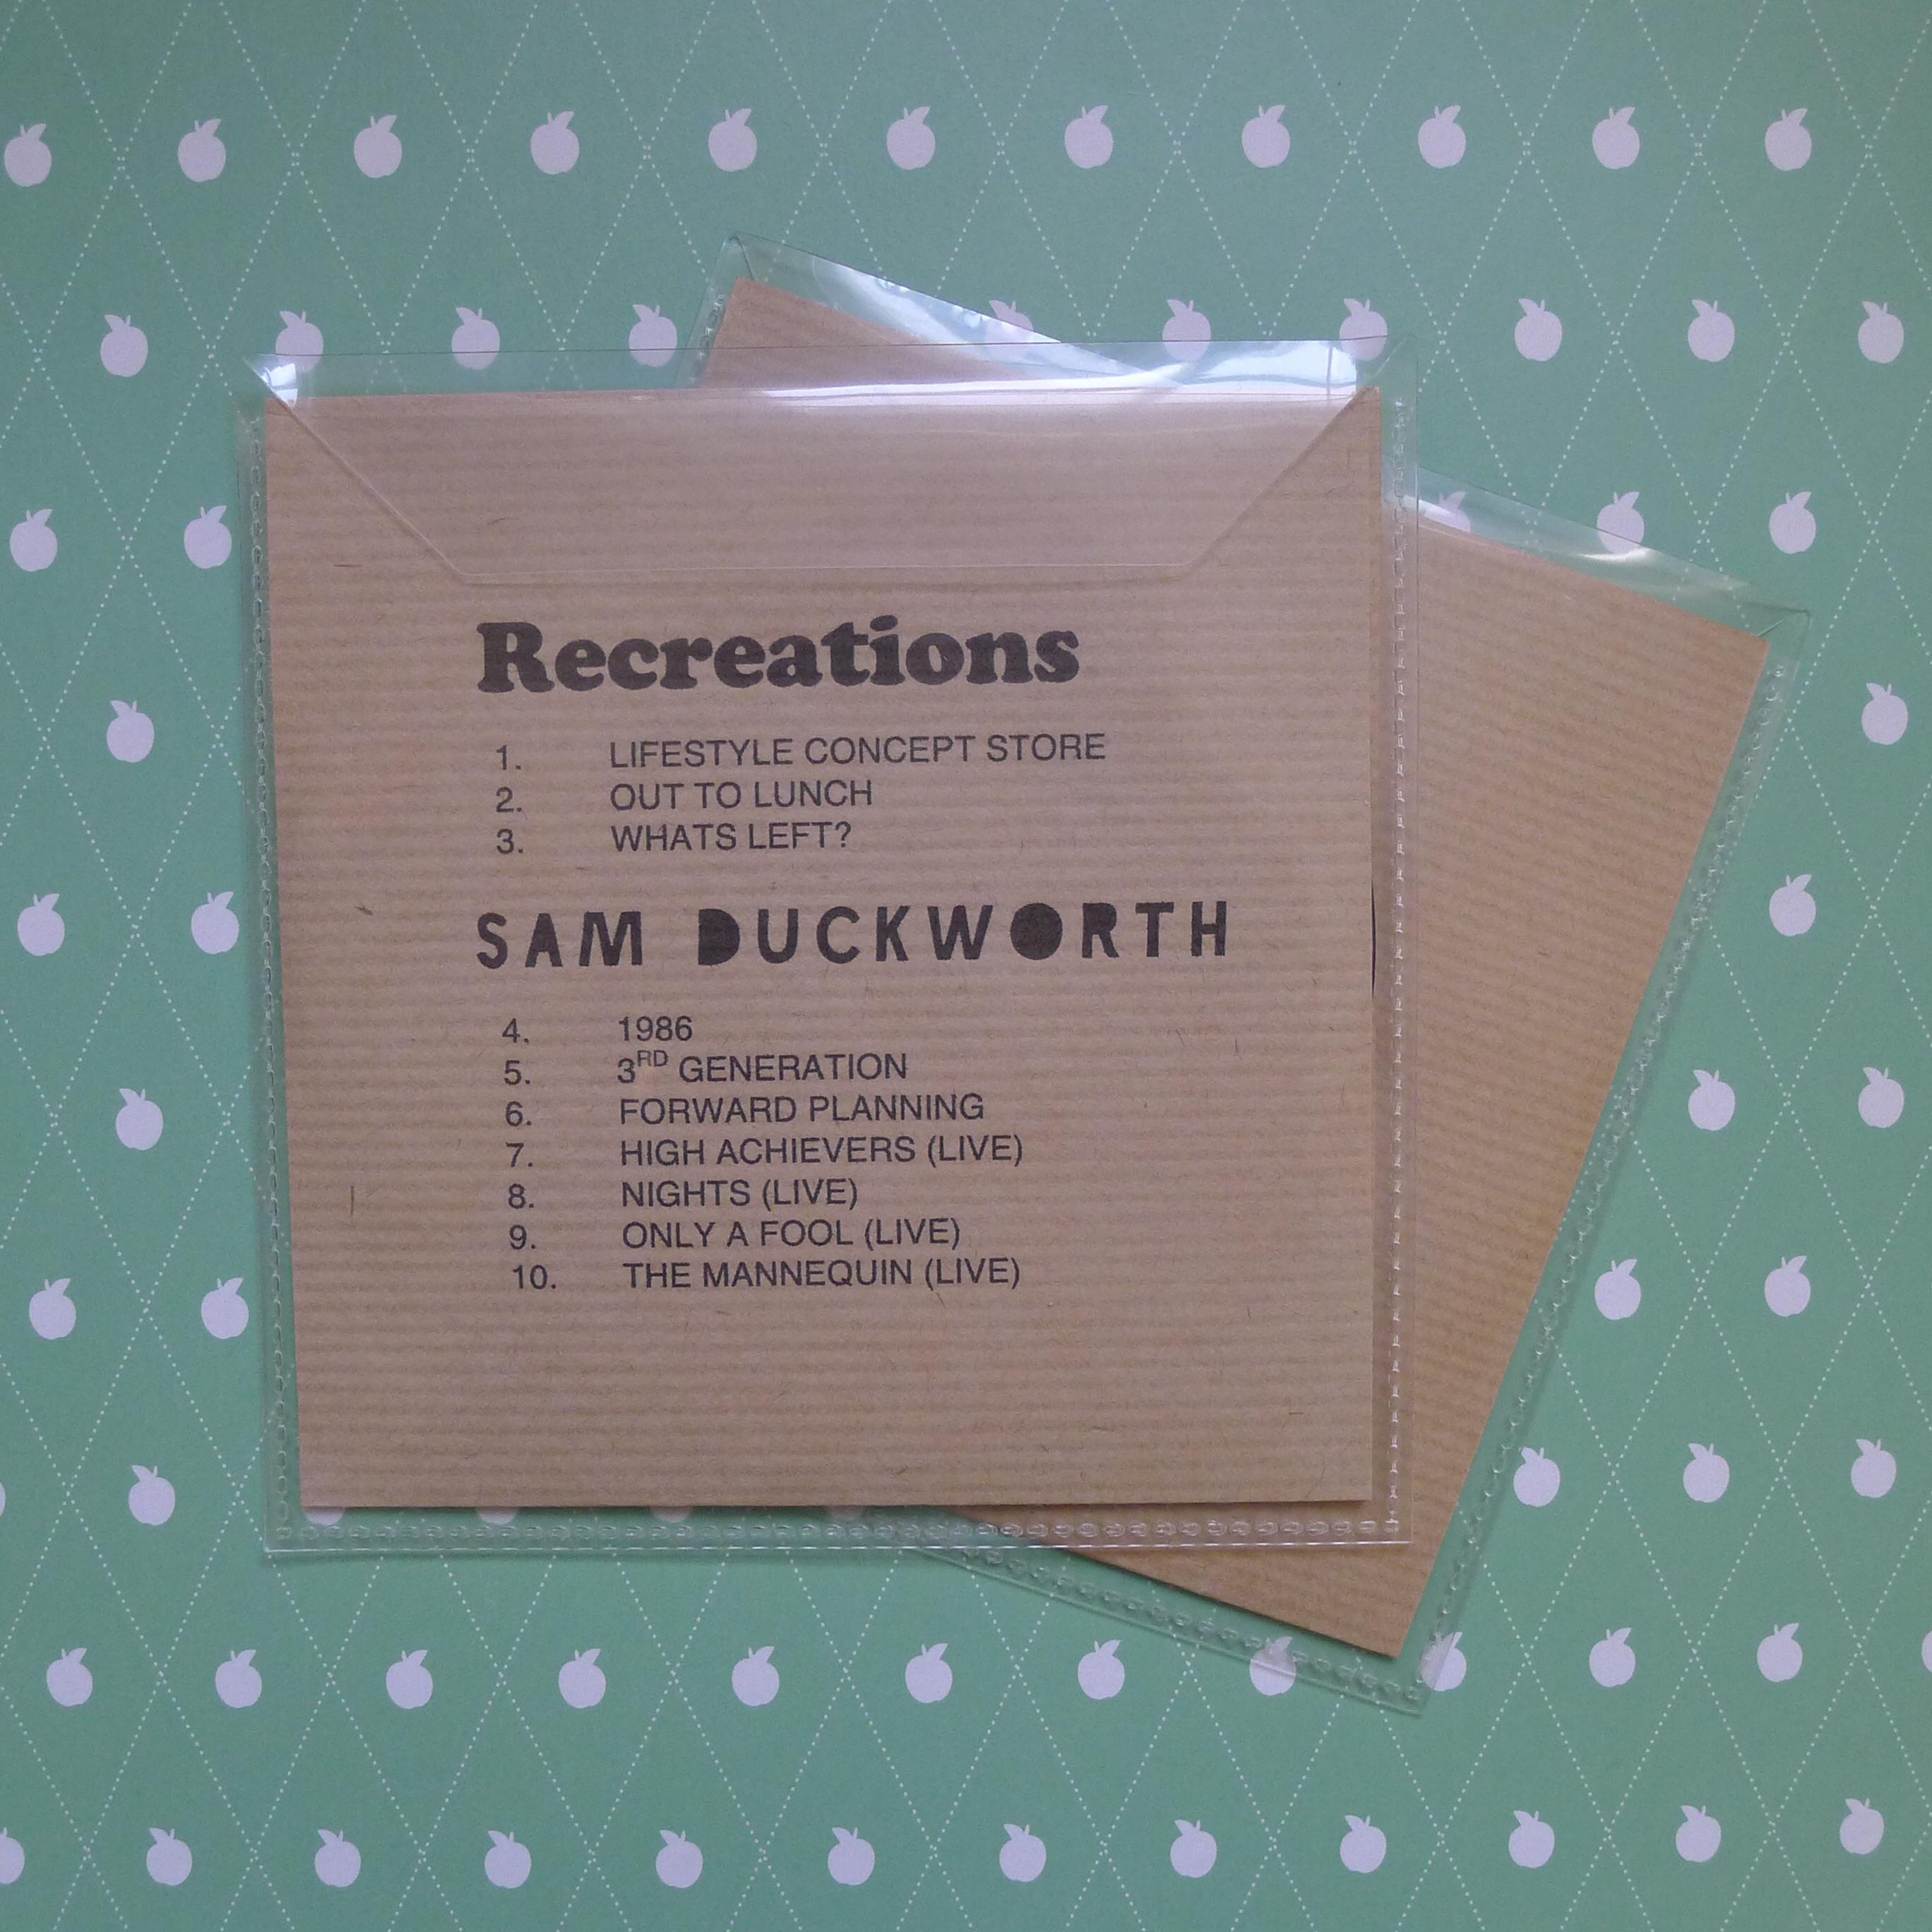 2015 Tour Bootleg (Recreations//SD Split)